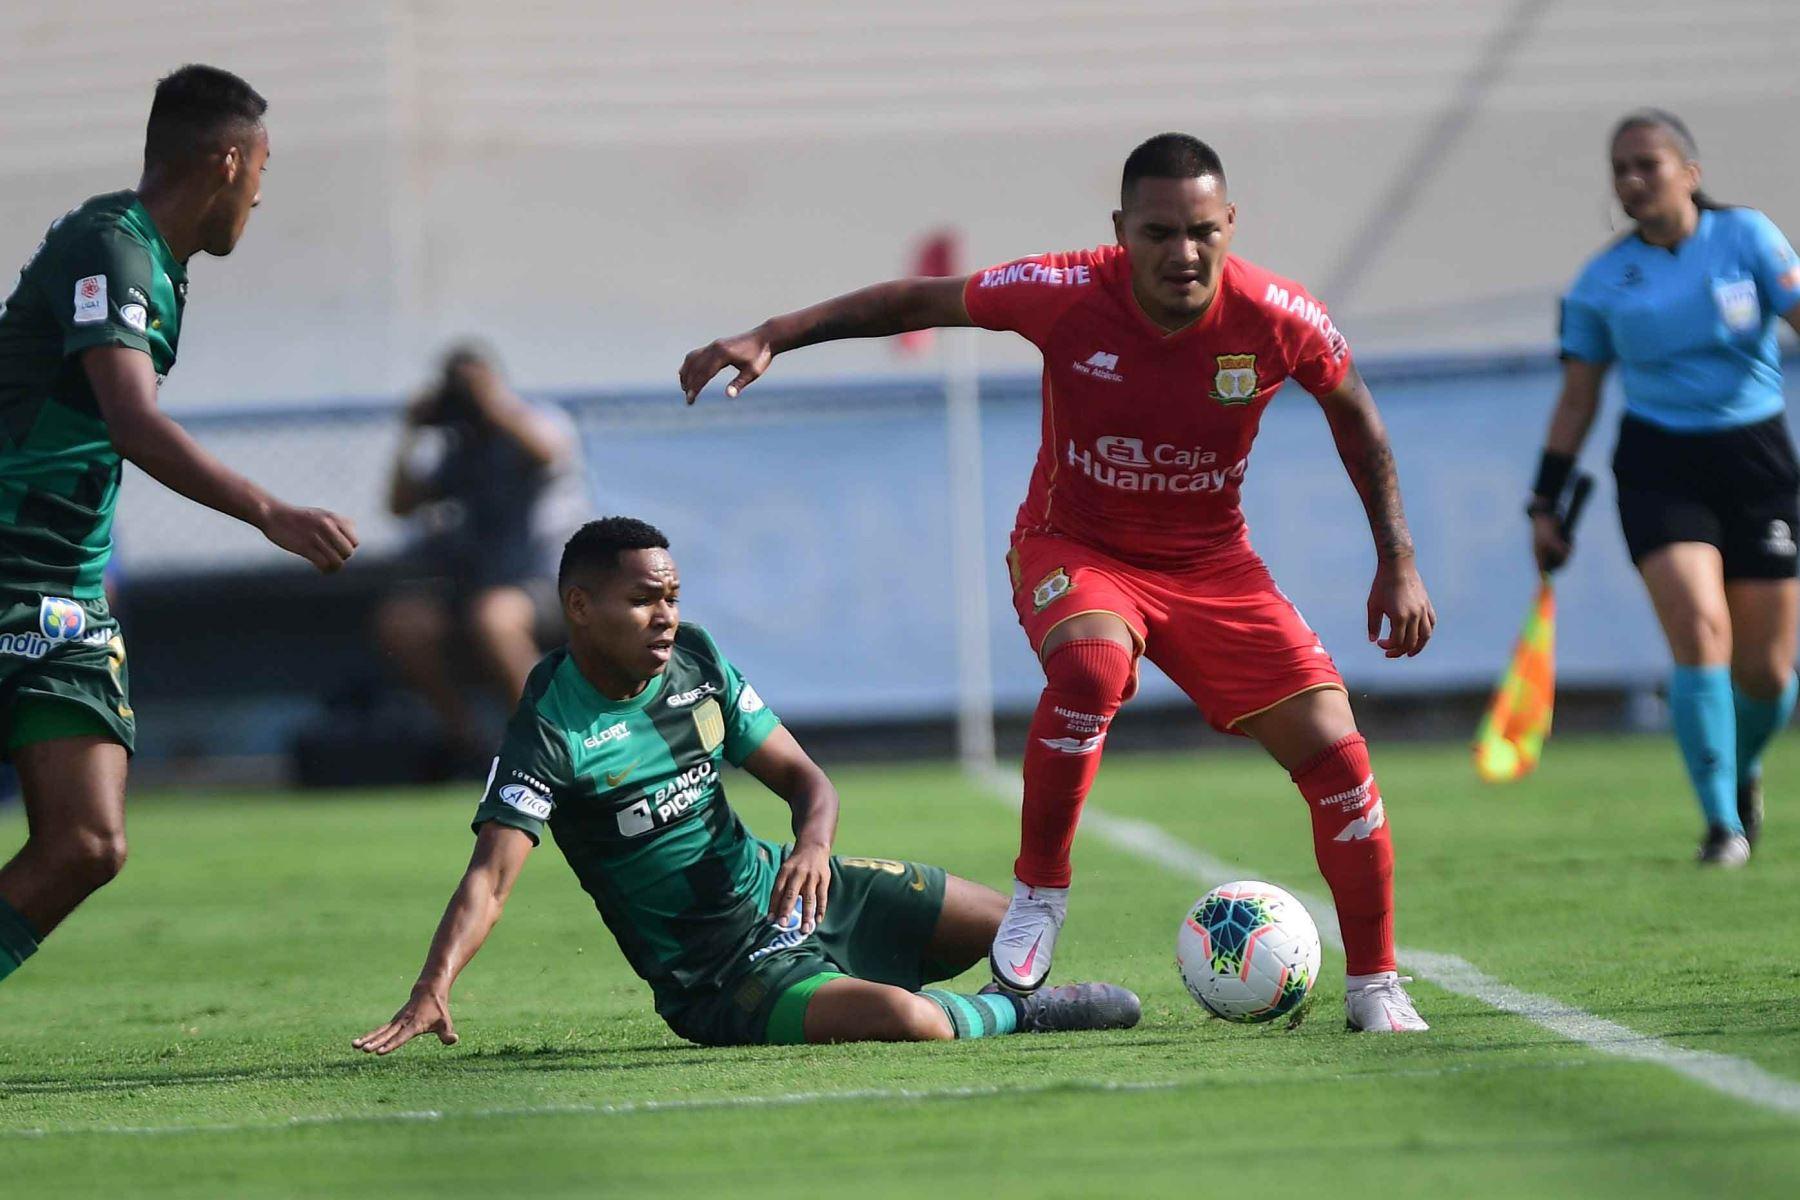 M. Cornejo de Alianza Lima disputa el balón con M. Velásquez de Sport Huancayo.  Foto:ANDINA/ Liga1